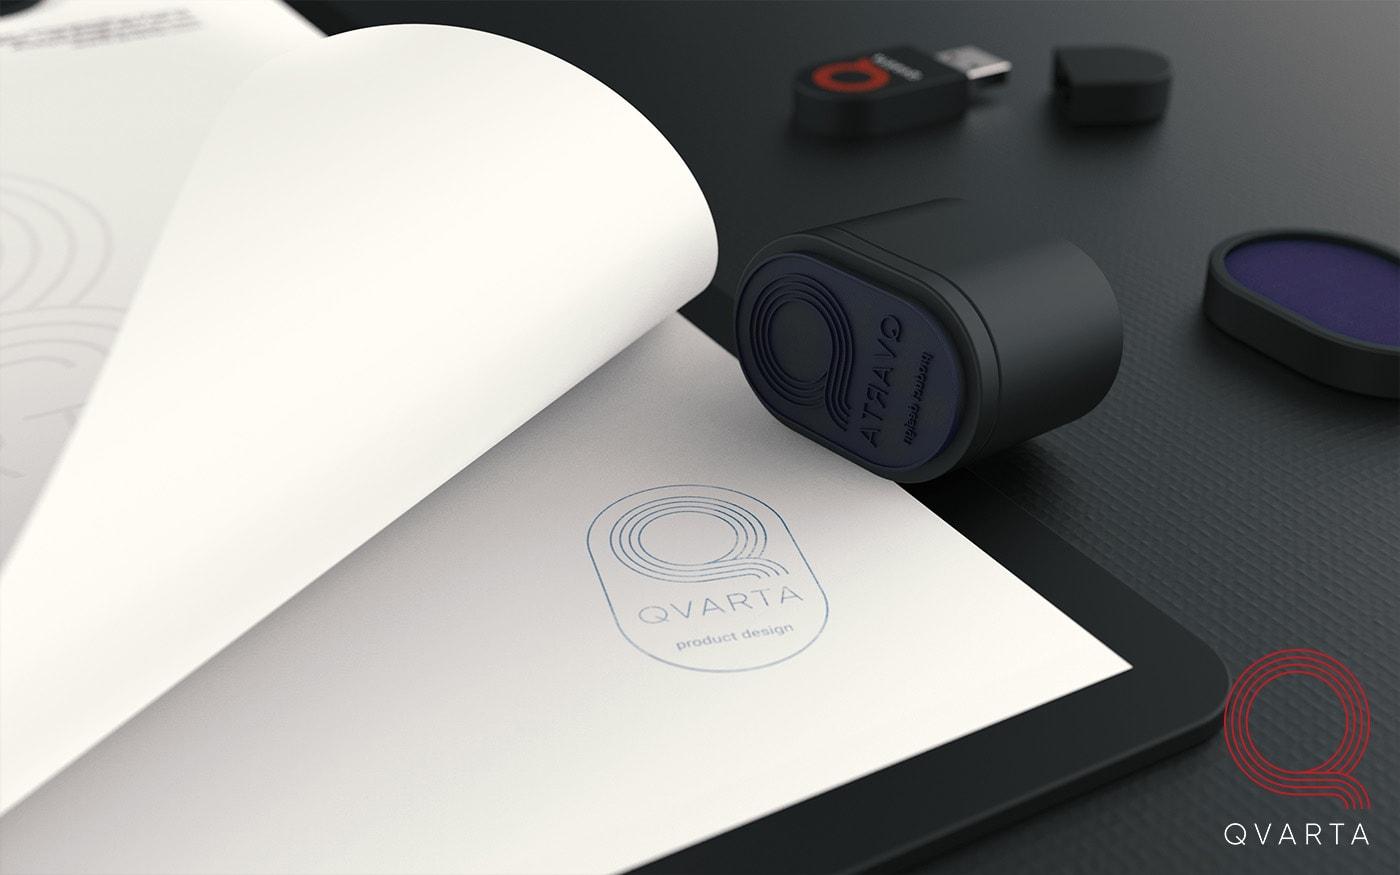 Мокрая печать с лого Qvarta.